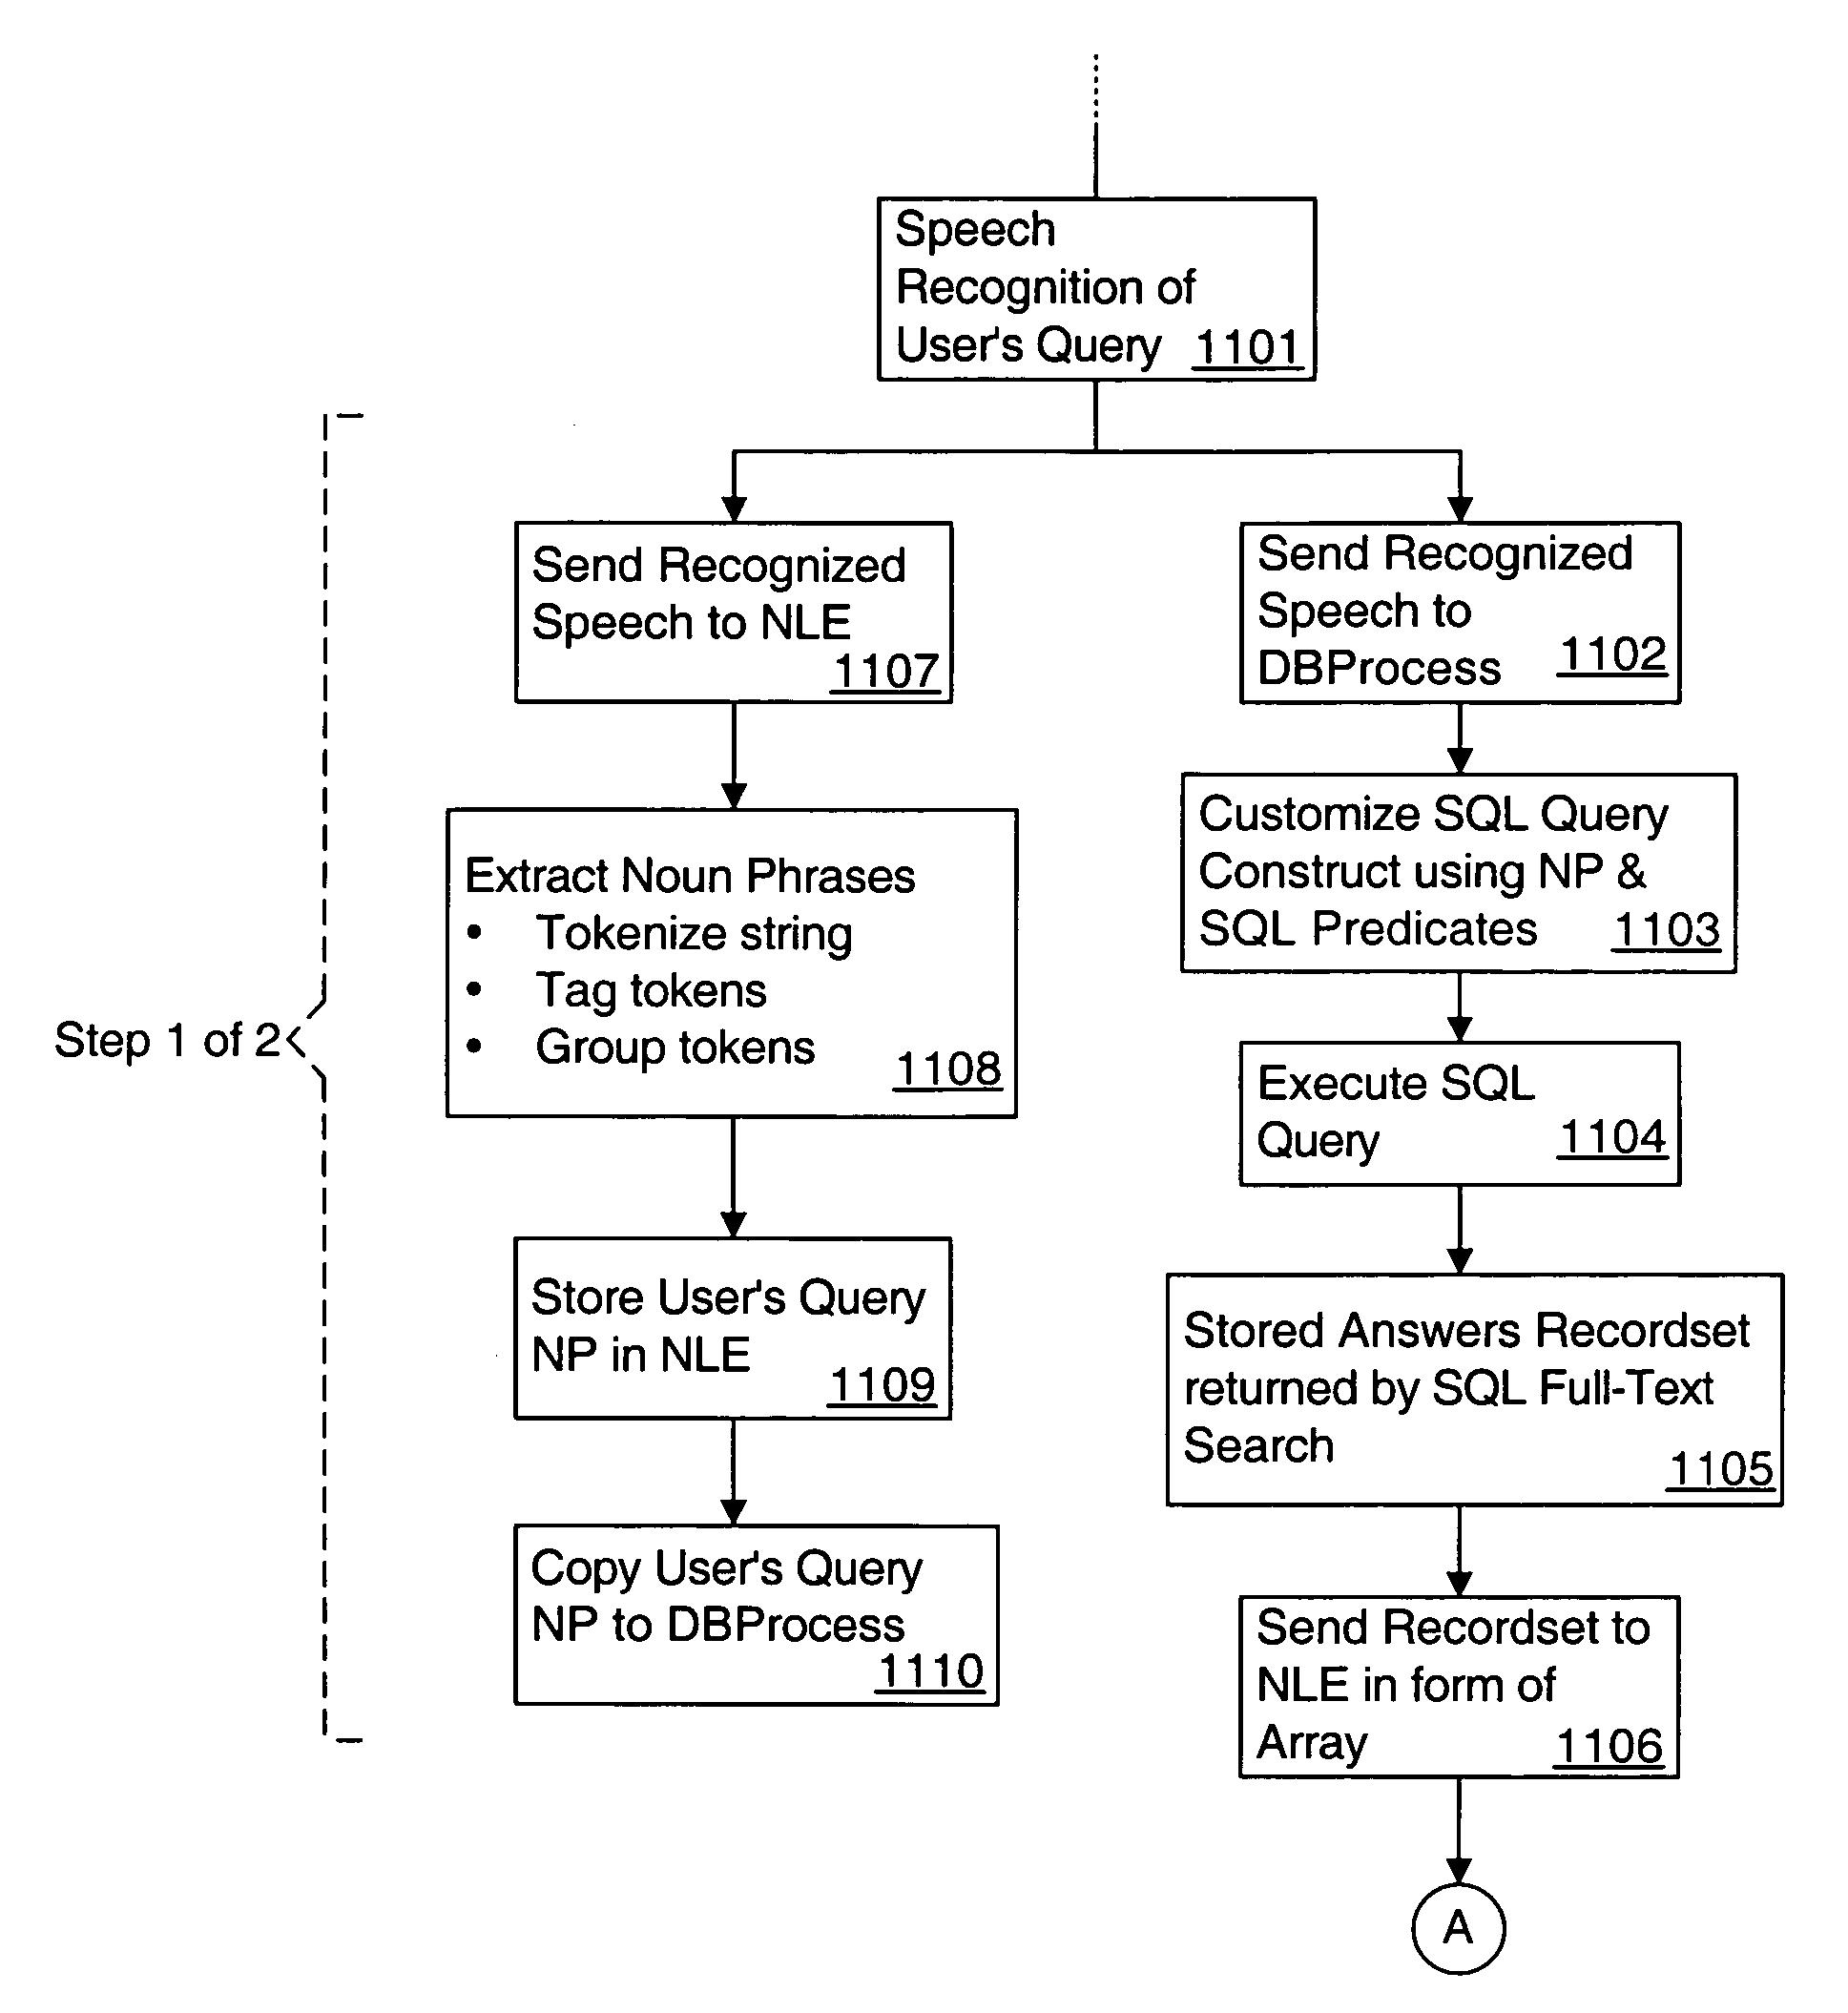 Patent US 7,657,424 B2